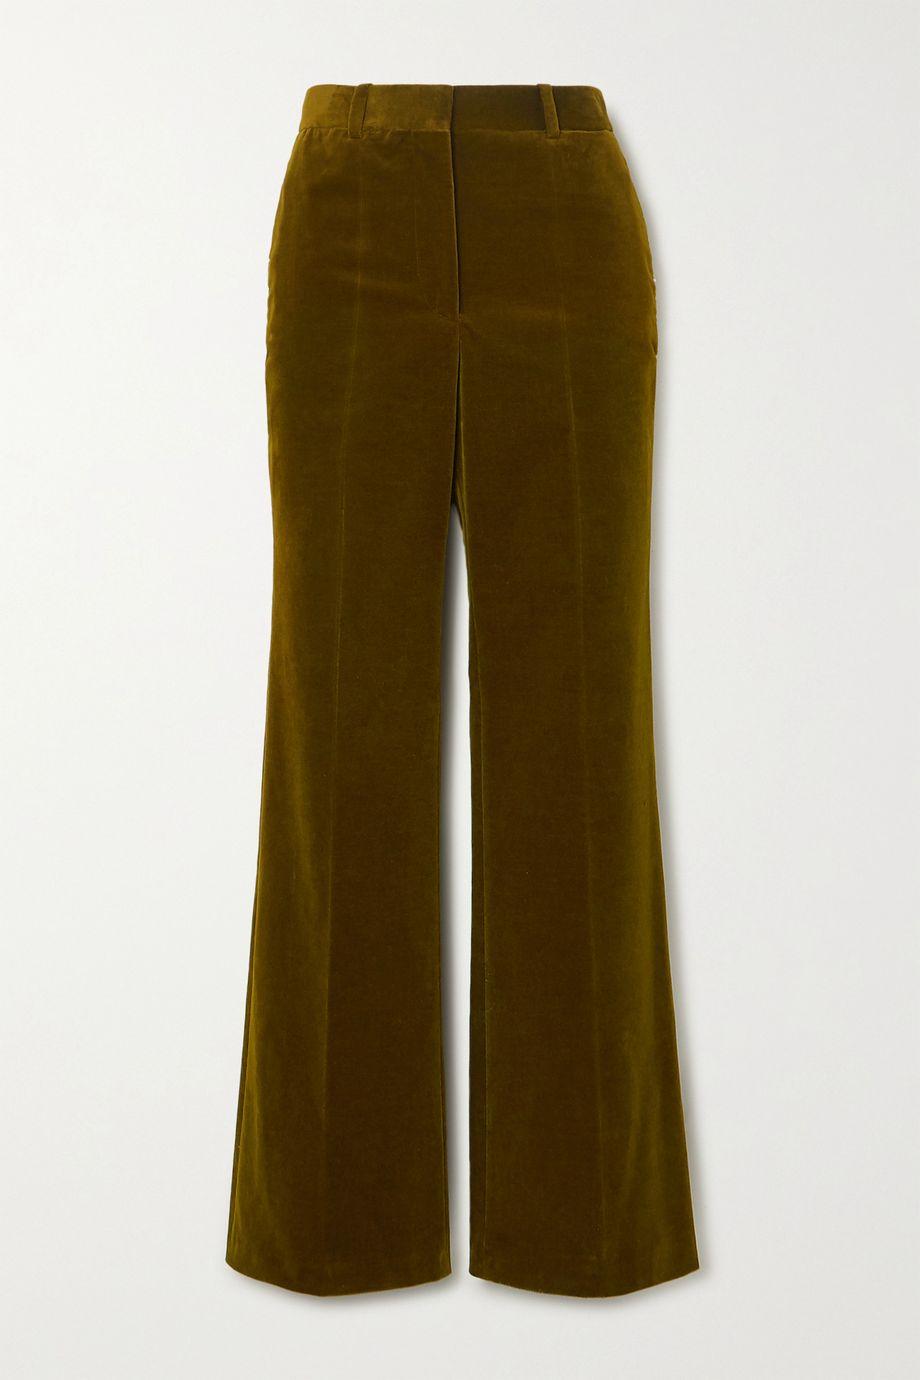 Victoria Beckham Cotton-blend velvet wide-leg pants